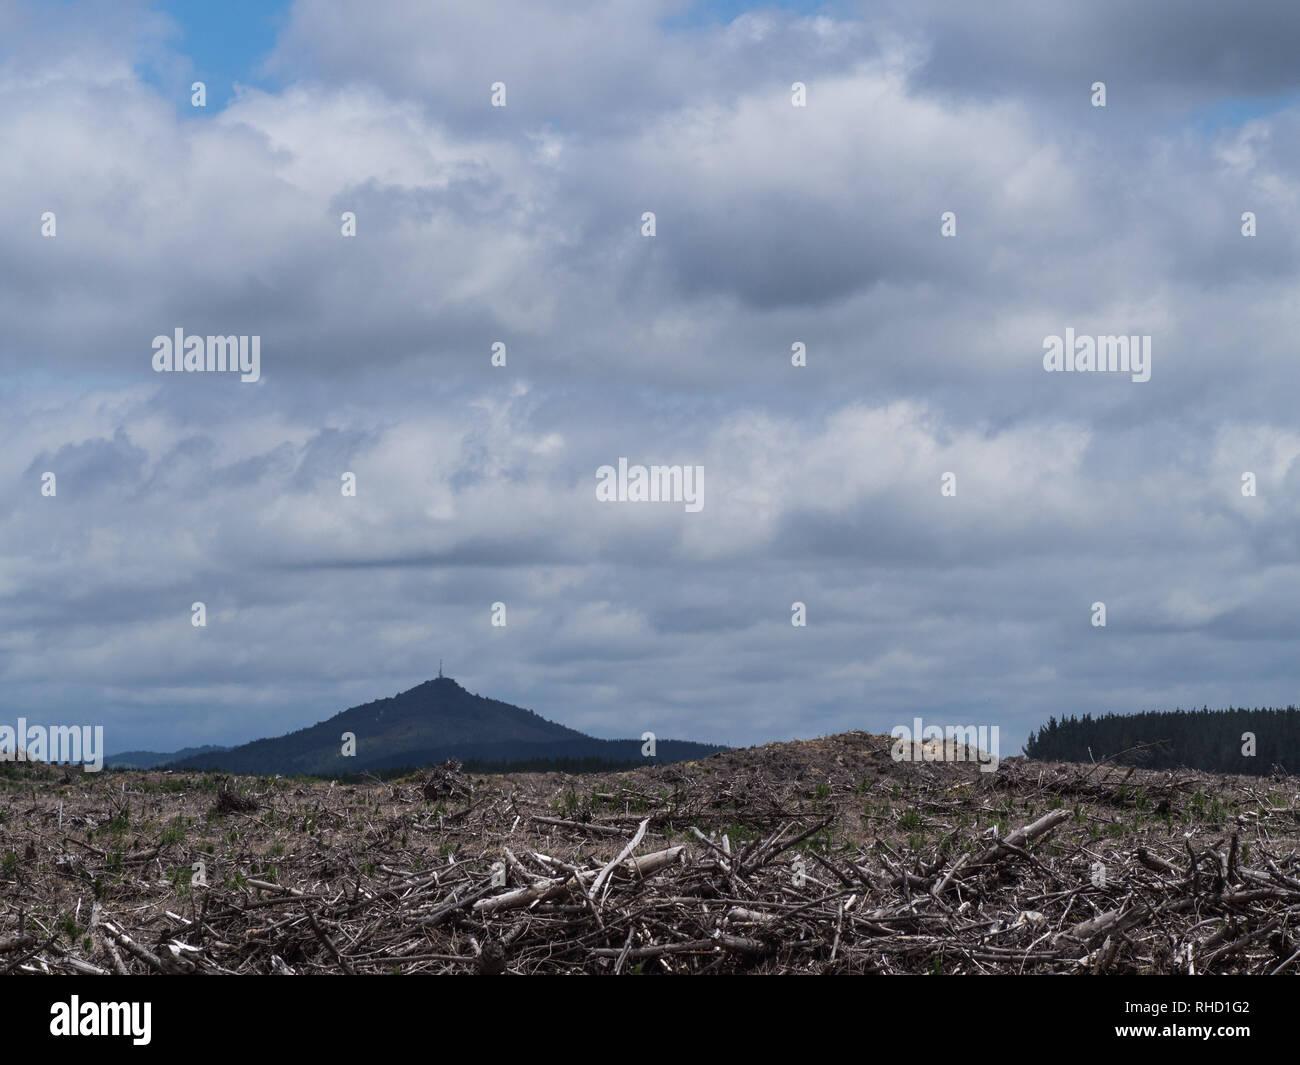 Logging slash, debris left after pine forest has been clear felled, Kaiangaroa Forest, Bay of Plenty, New Zealand - Stock Image